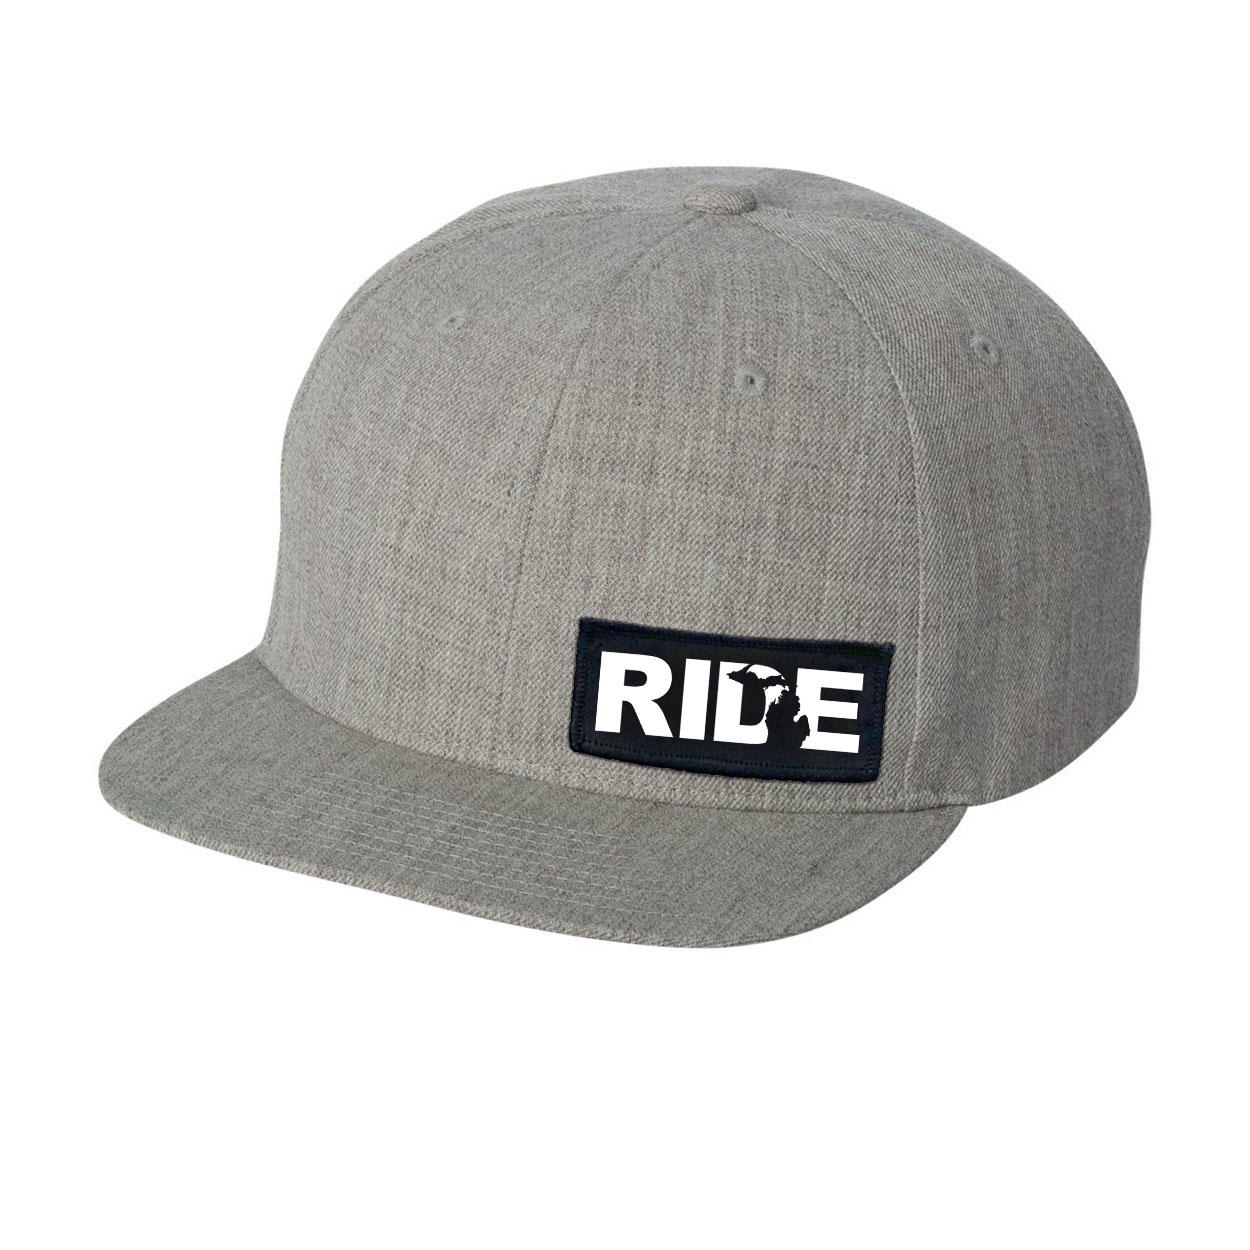 Ride Michigan Night Out Woven Patch Flat Brim Snapback Hat Heather Gray (White Logo)